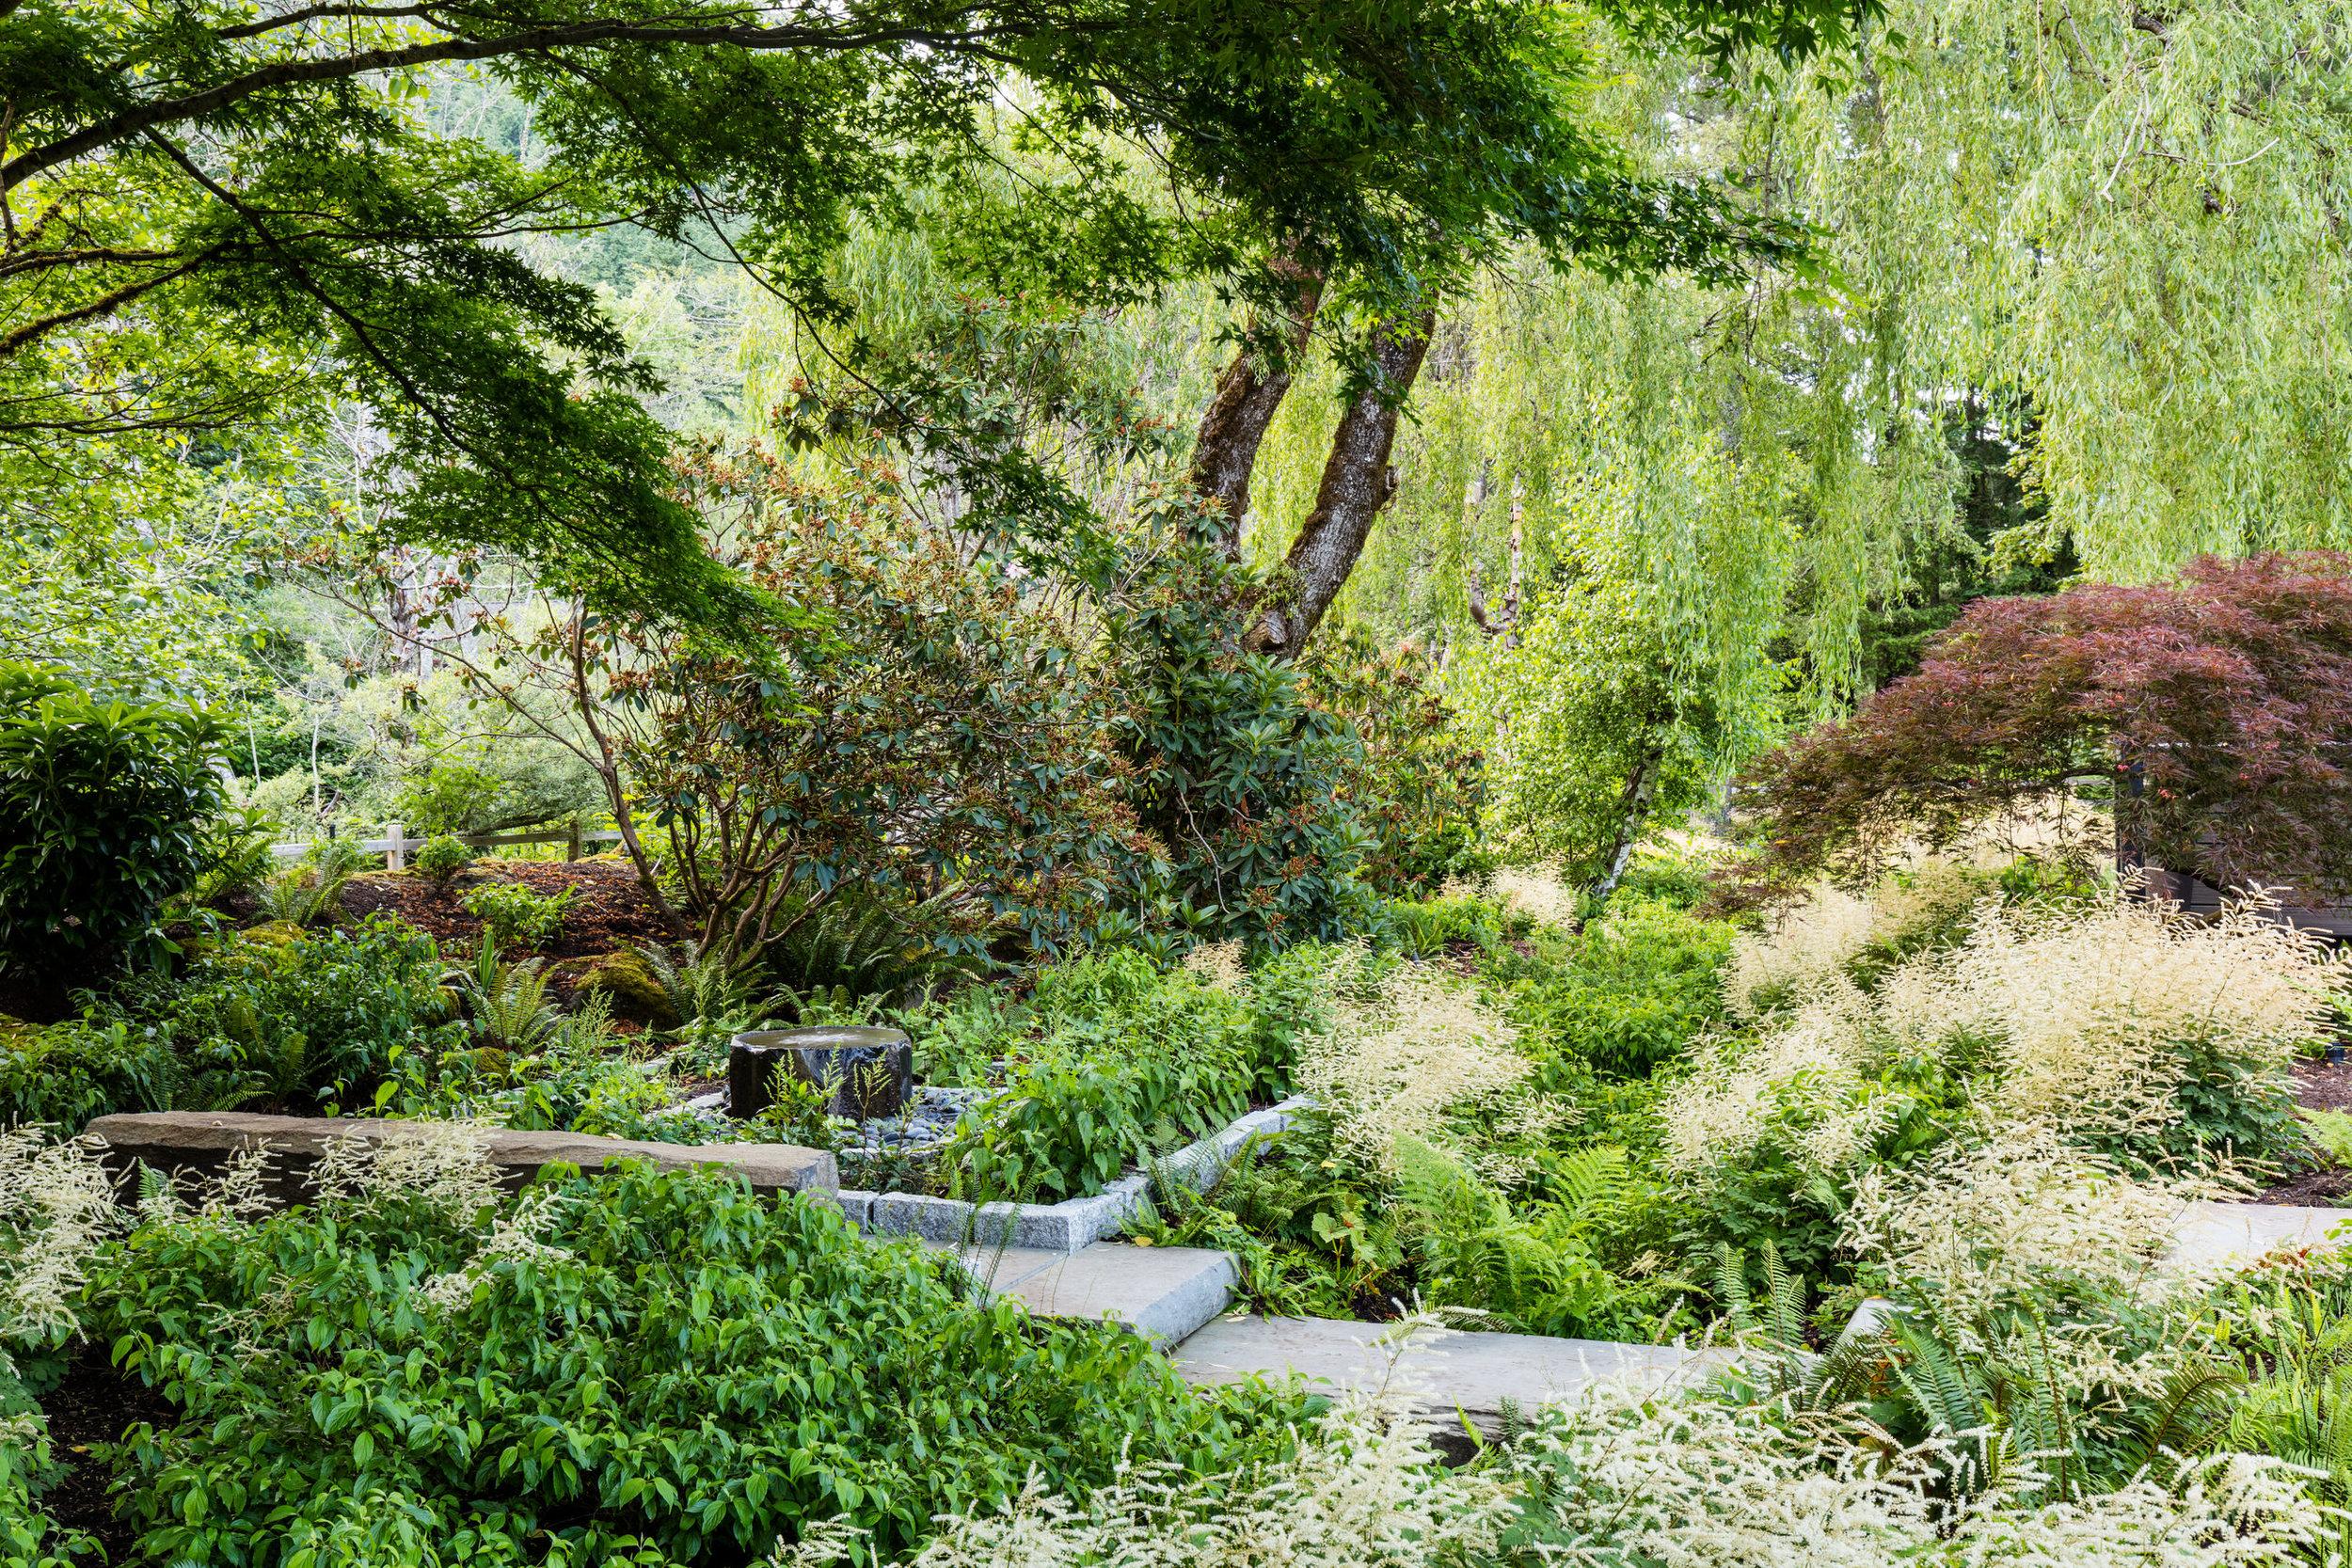 0015-Miranda-Estes-Land-Morphology-Issaquah-Creek-Garden-20190610.jpg